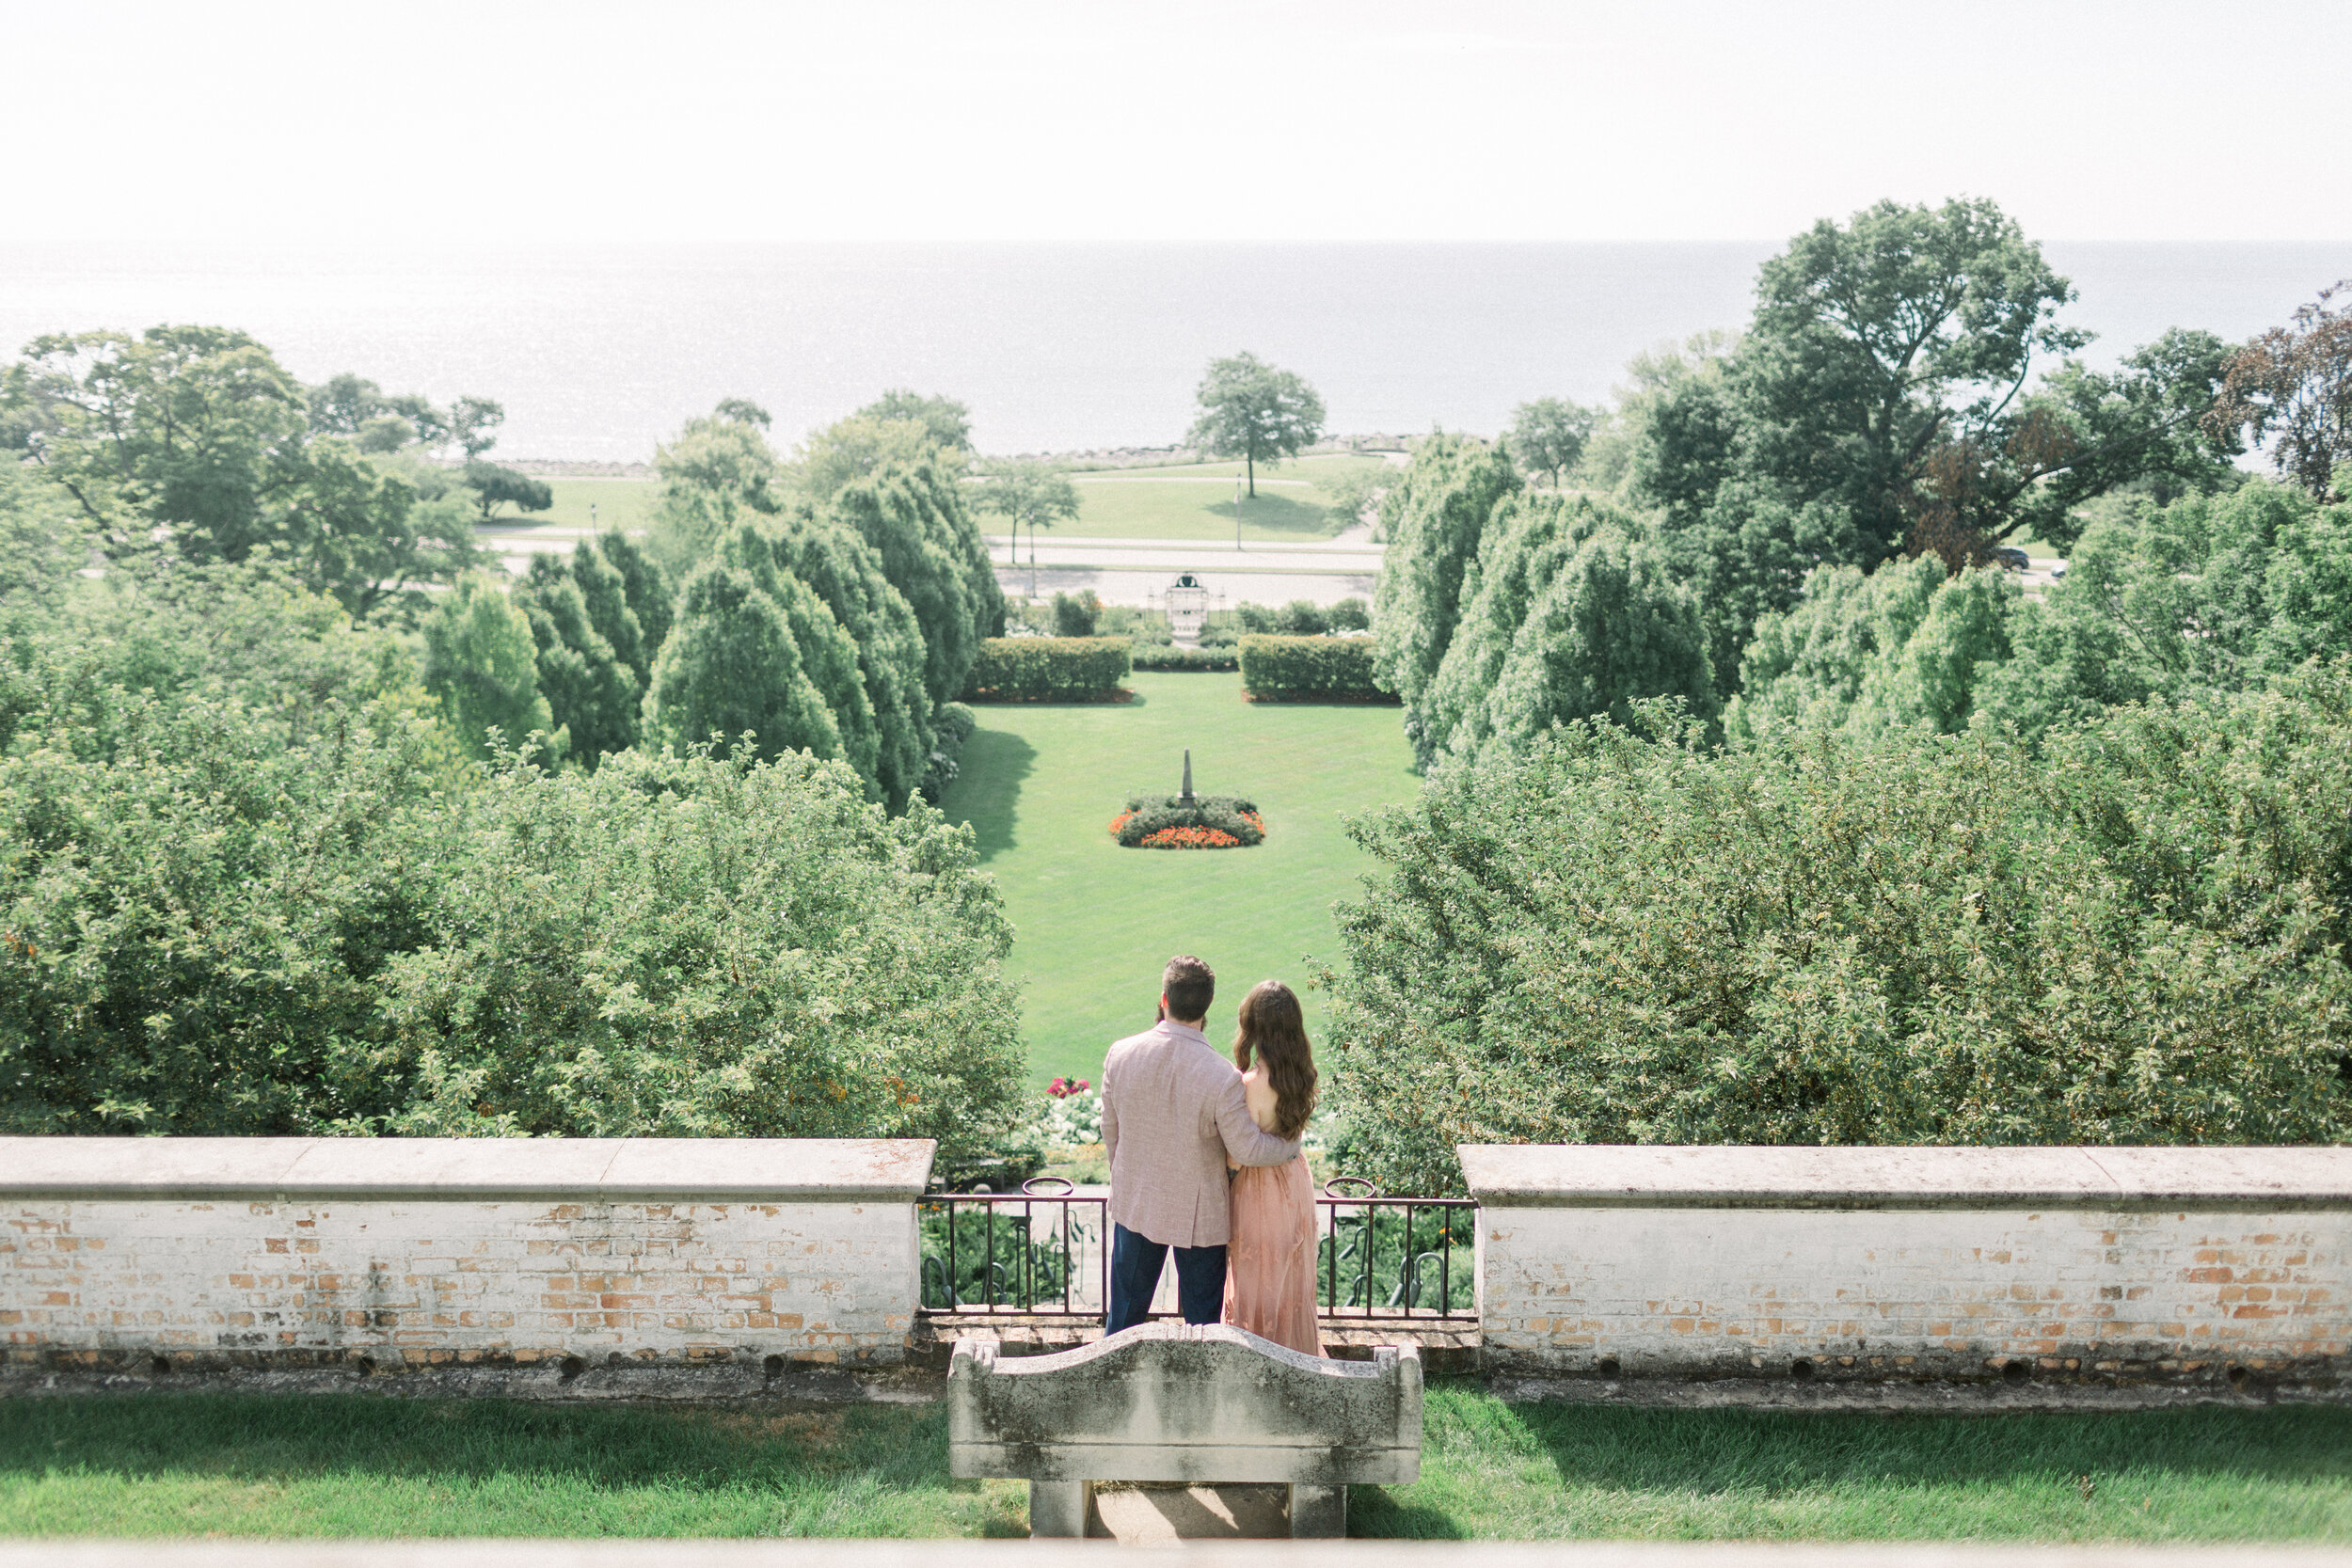 Couple on Villa Terrace balcony overlooking water